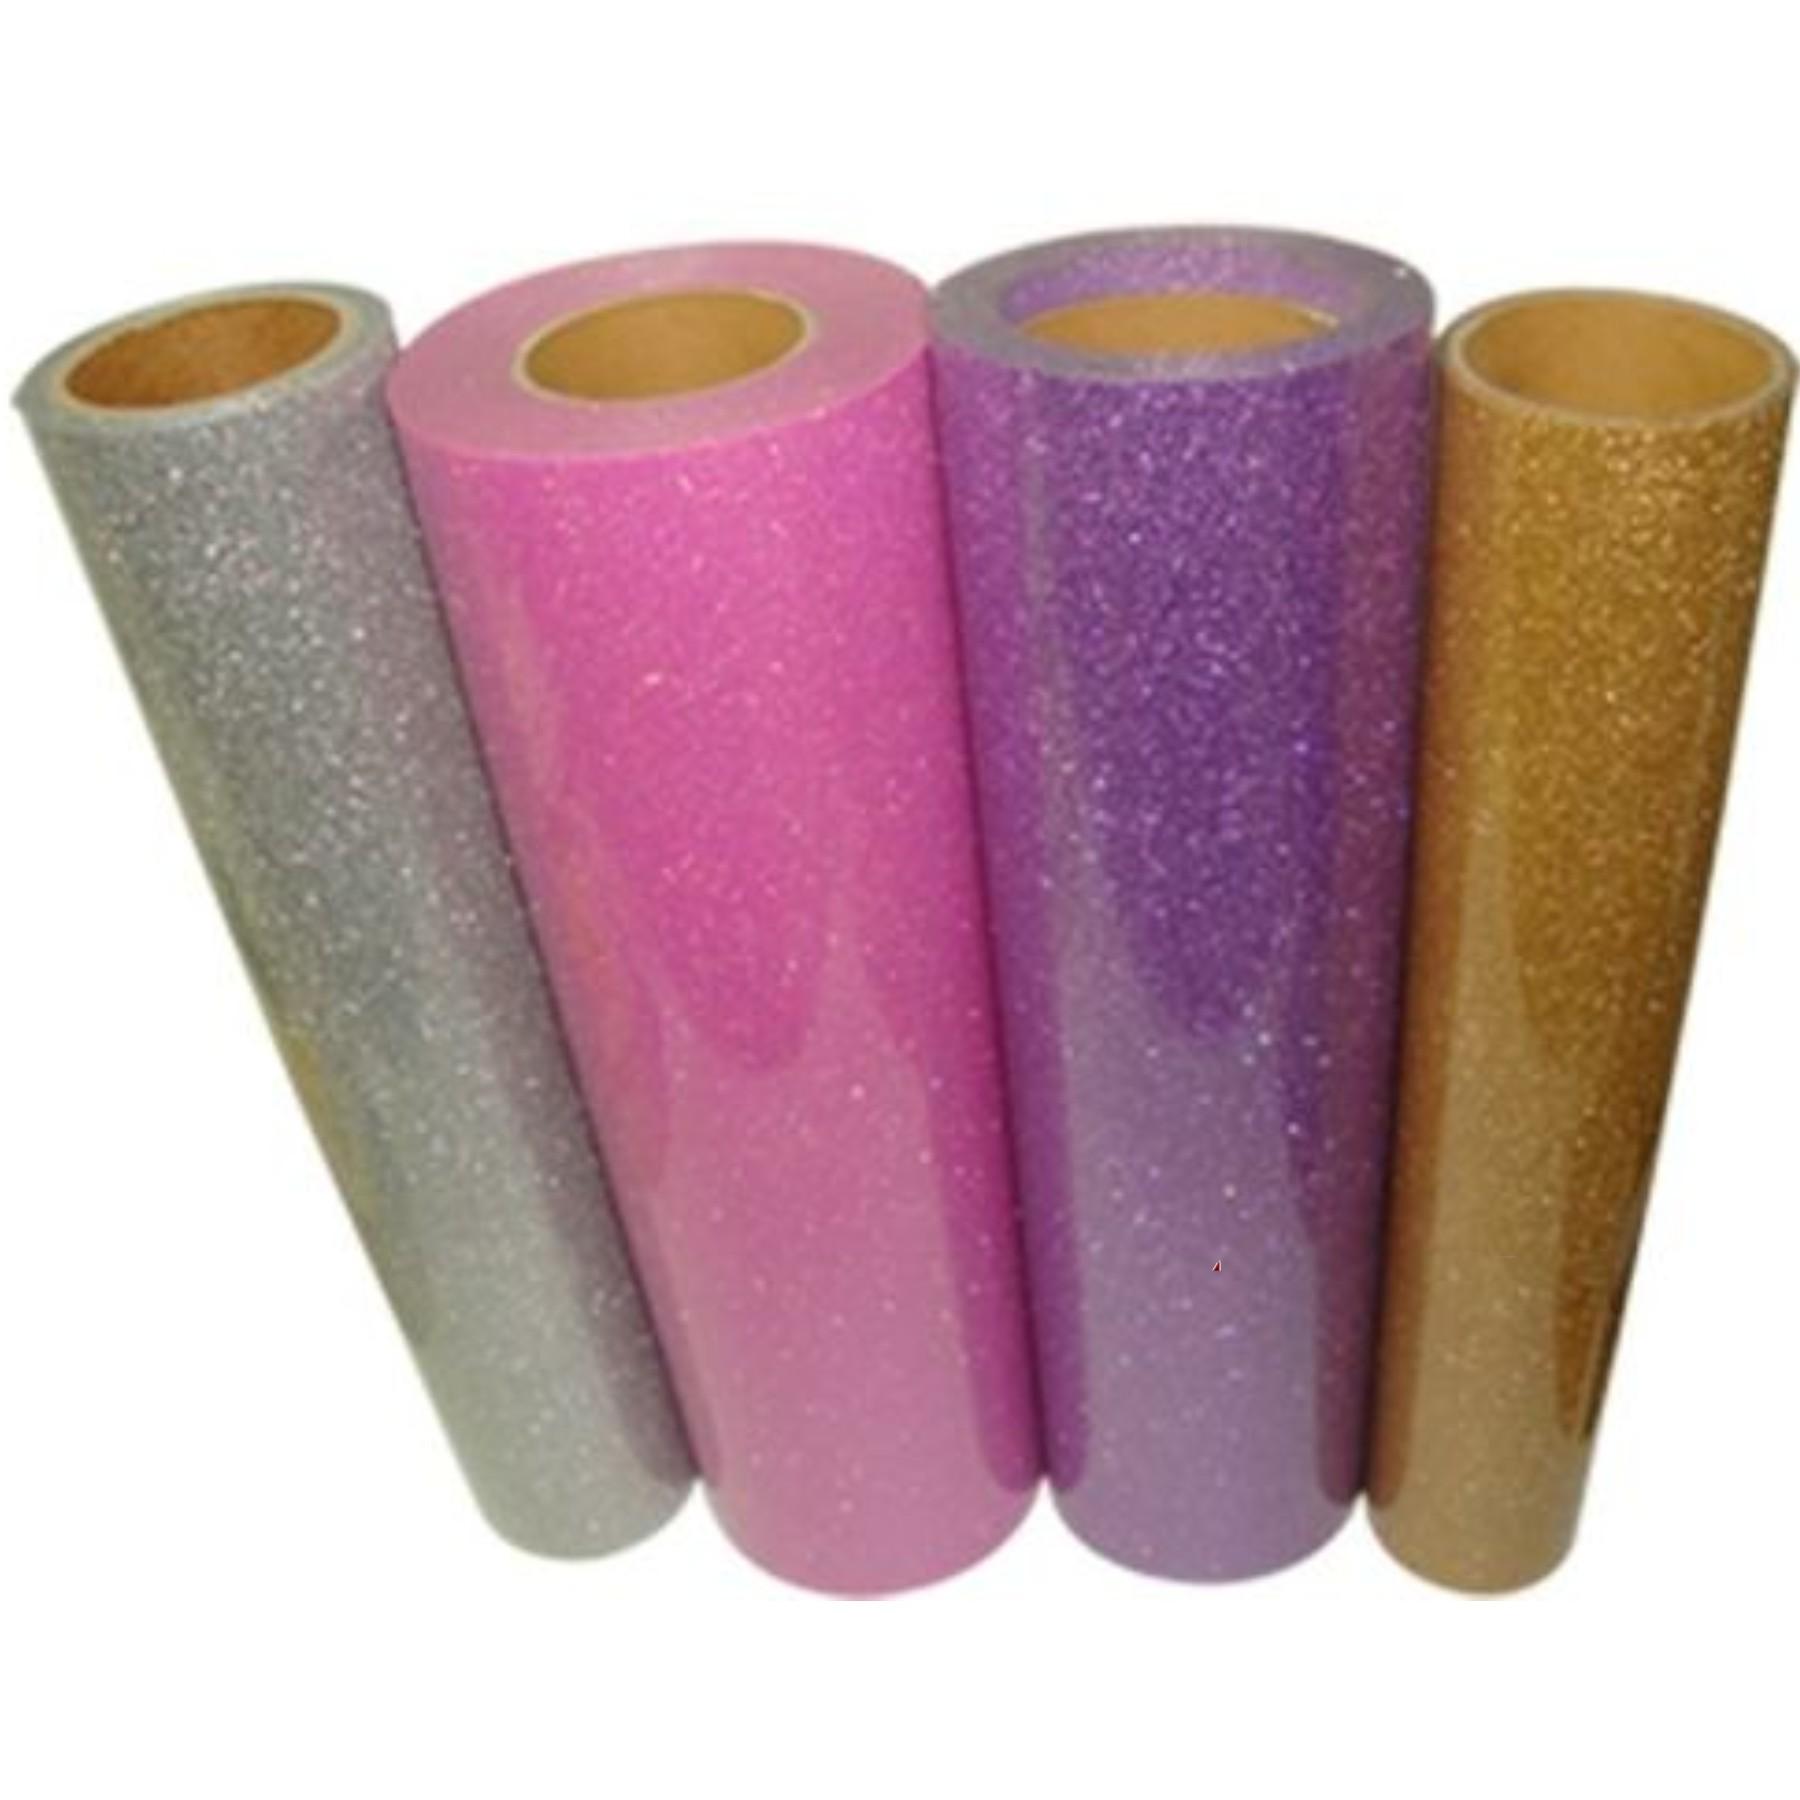 Vinilo termotransferible glitter 30 x 50 cm